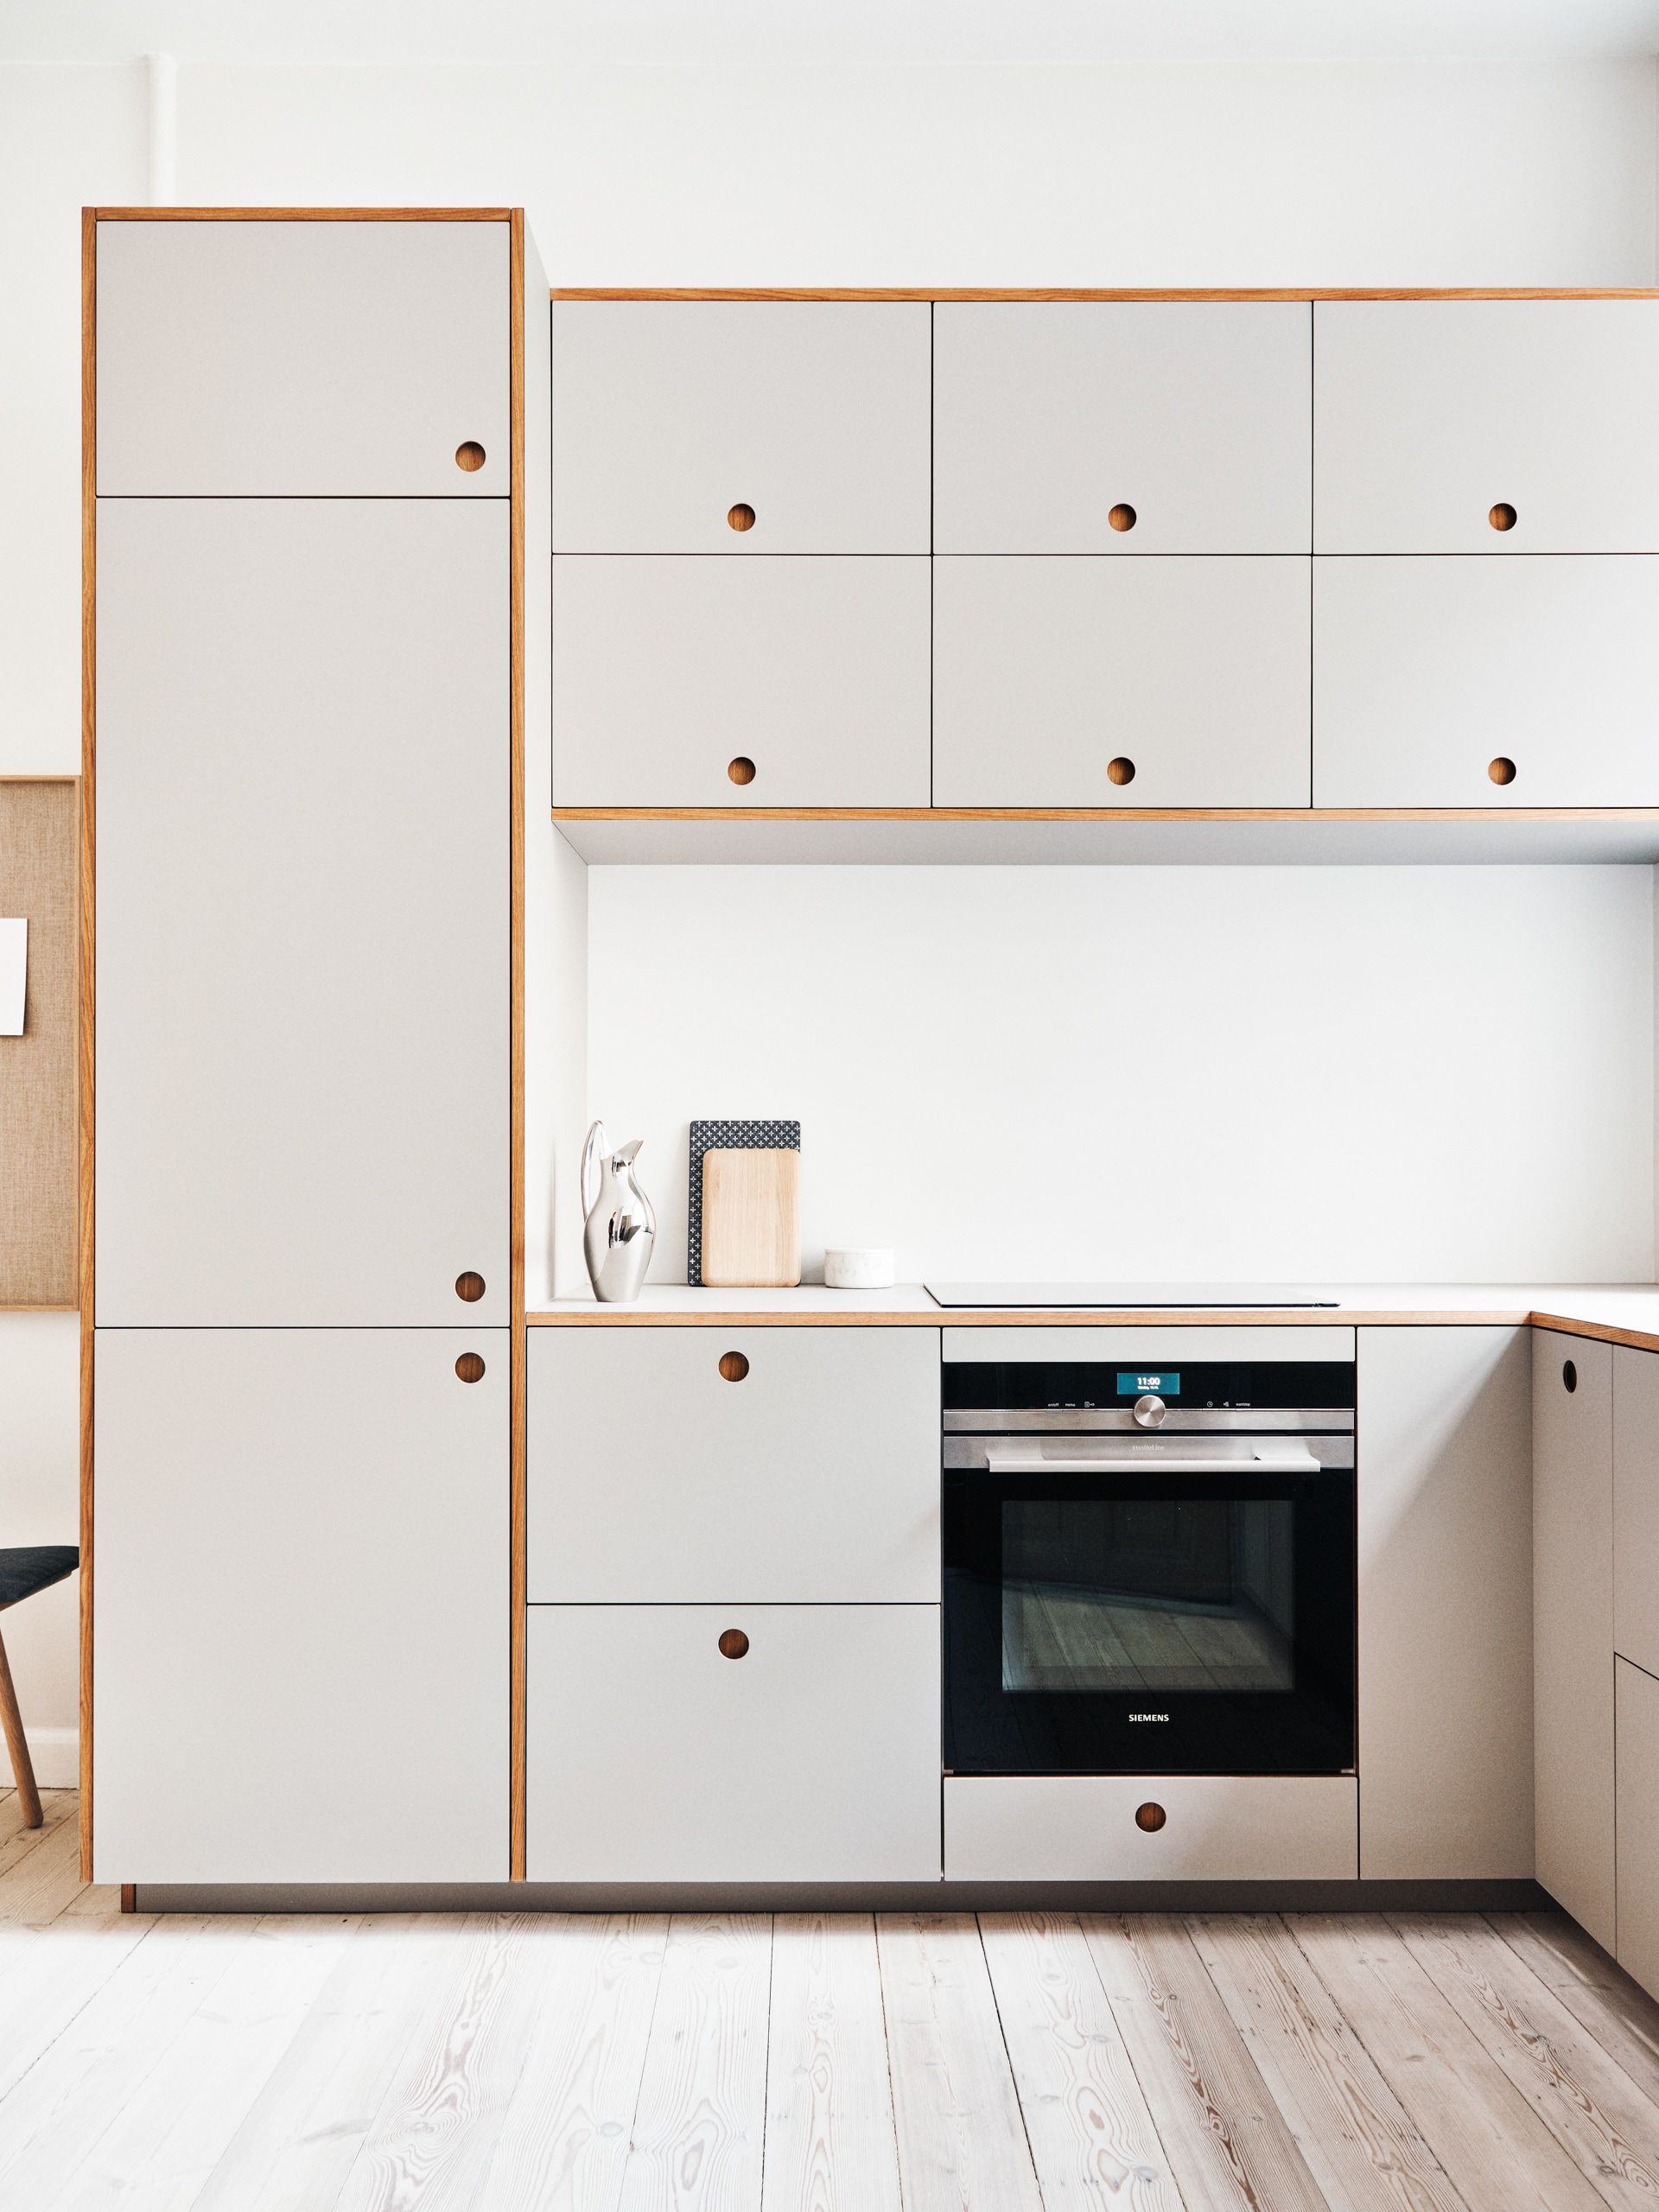 Inspiration Willemoesgade Copenhagen In 2020 Interior Design Kitchen Scandinavian Cabinets Linoleum